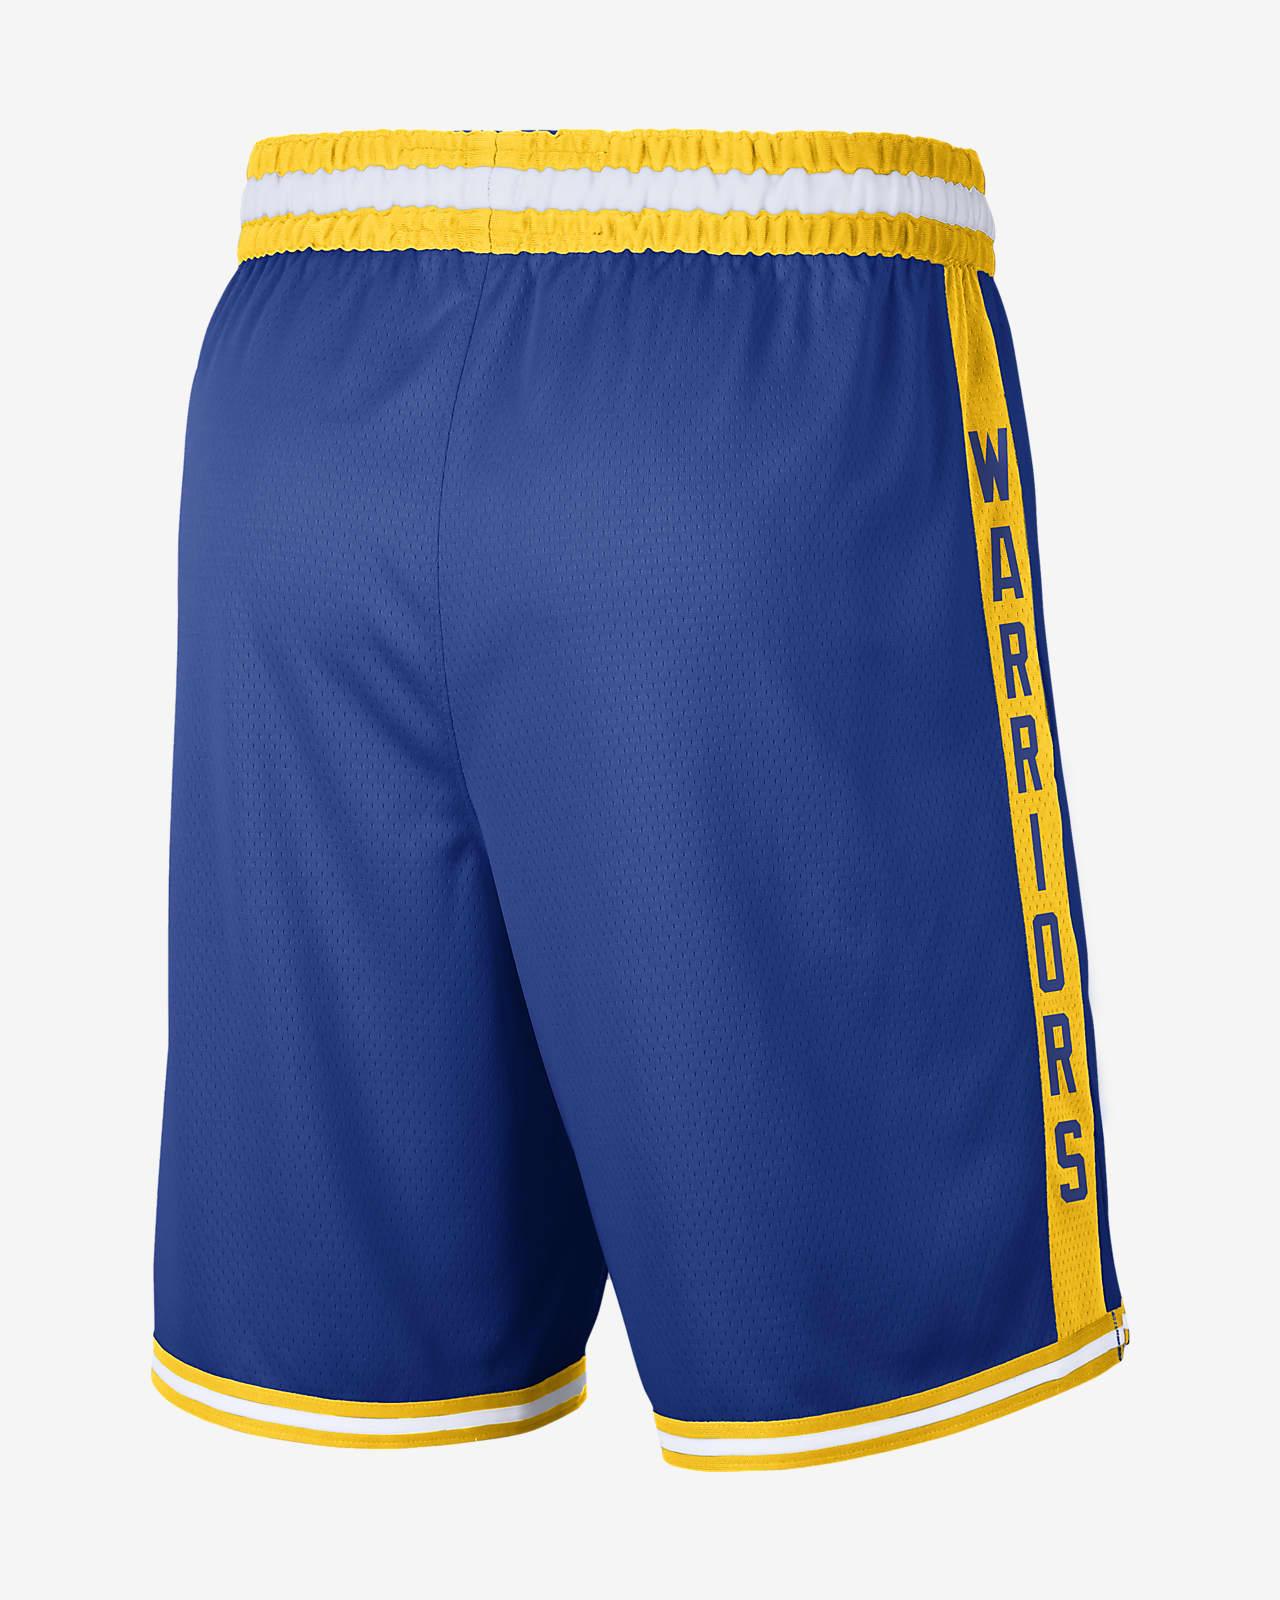 Shorts Nike Nba Swingman Para Hombre De Los Golden State Warriors Classic Edition 2020 Nike Cl